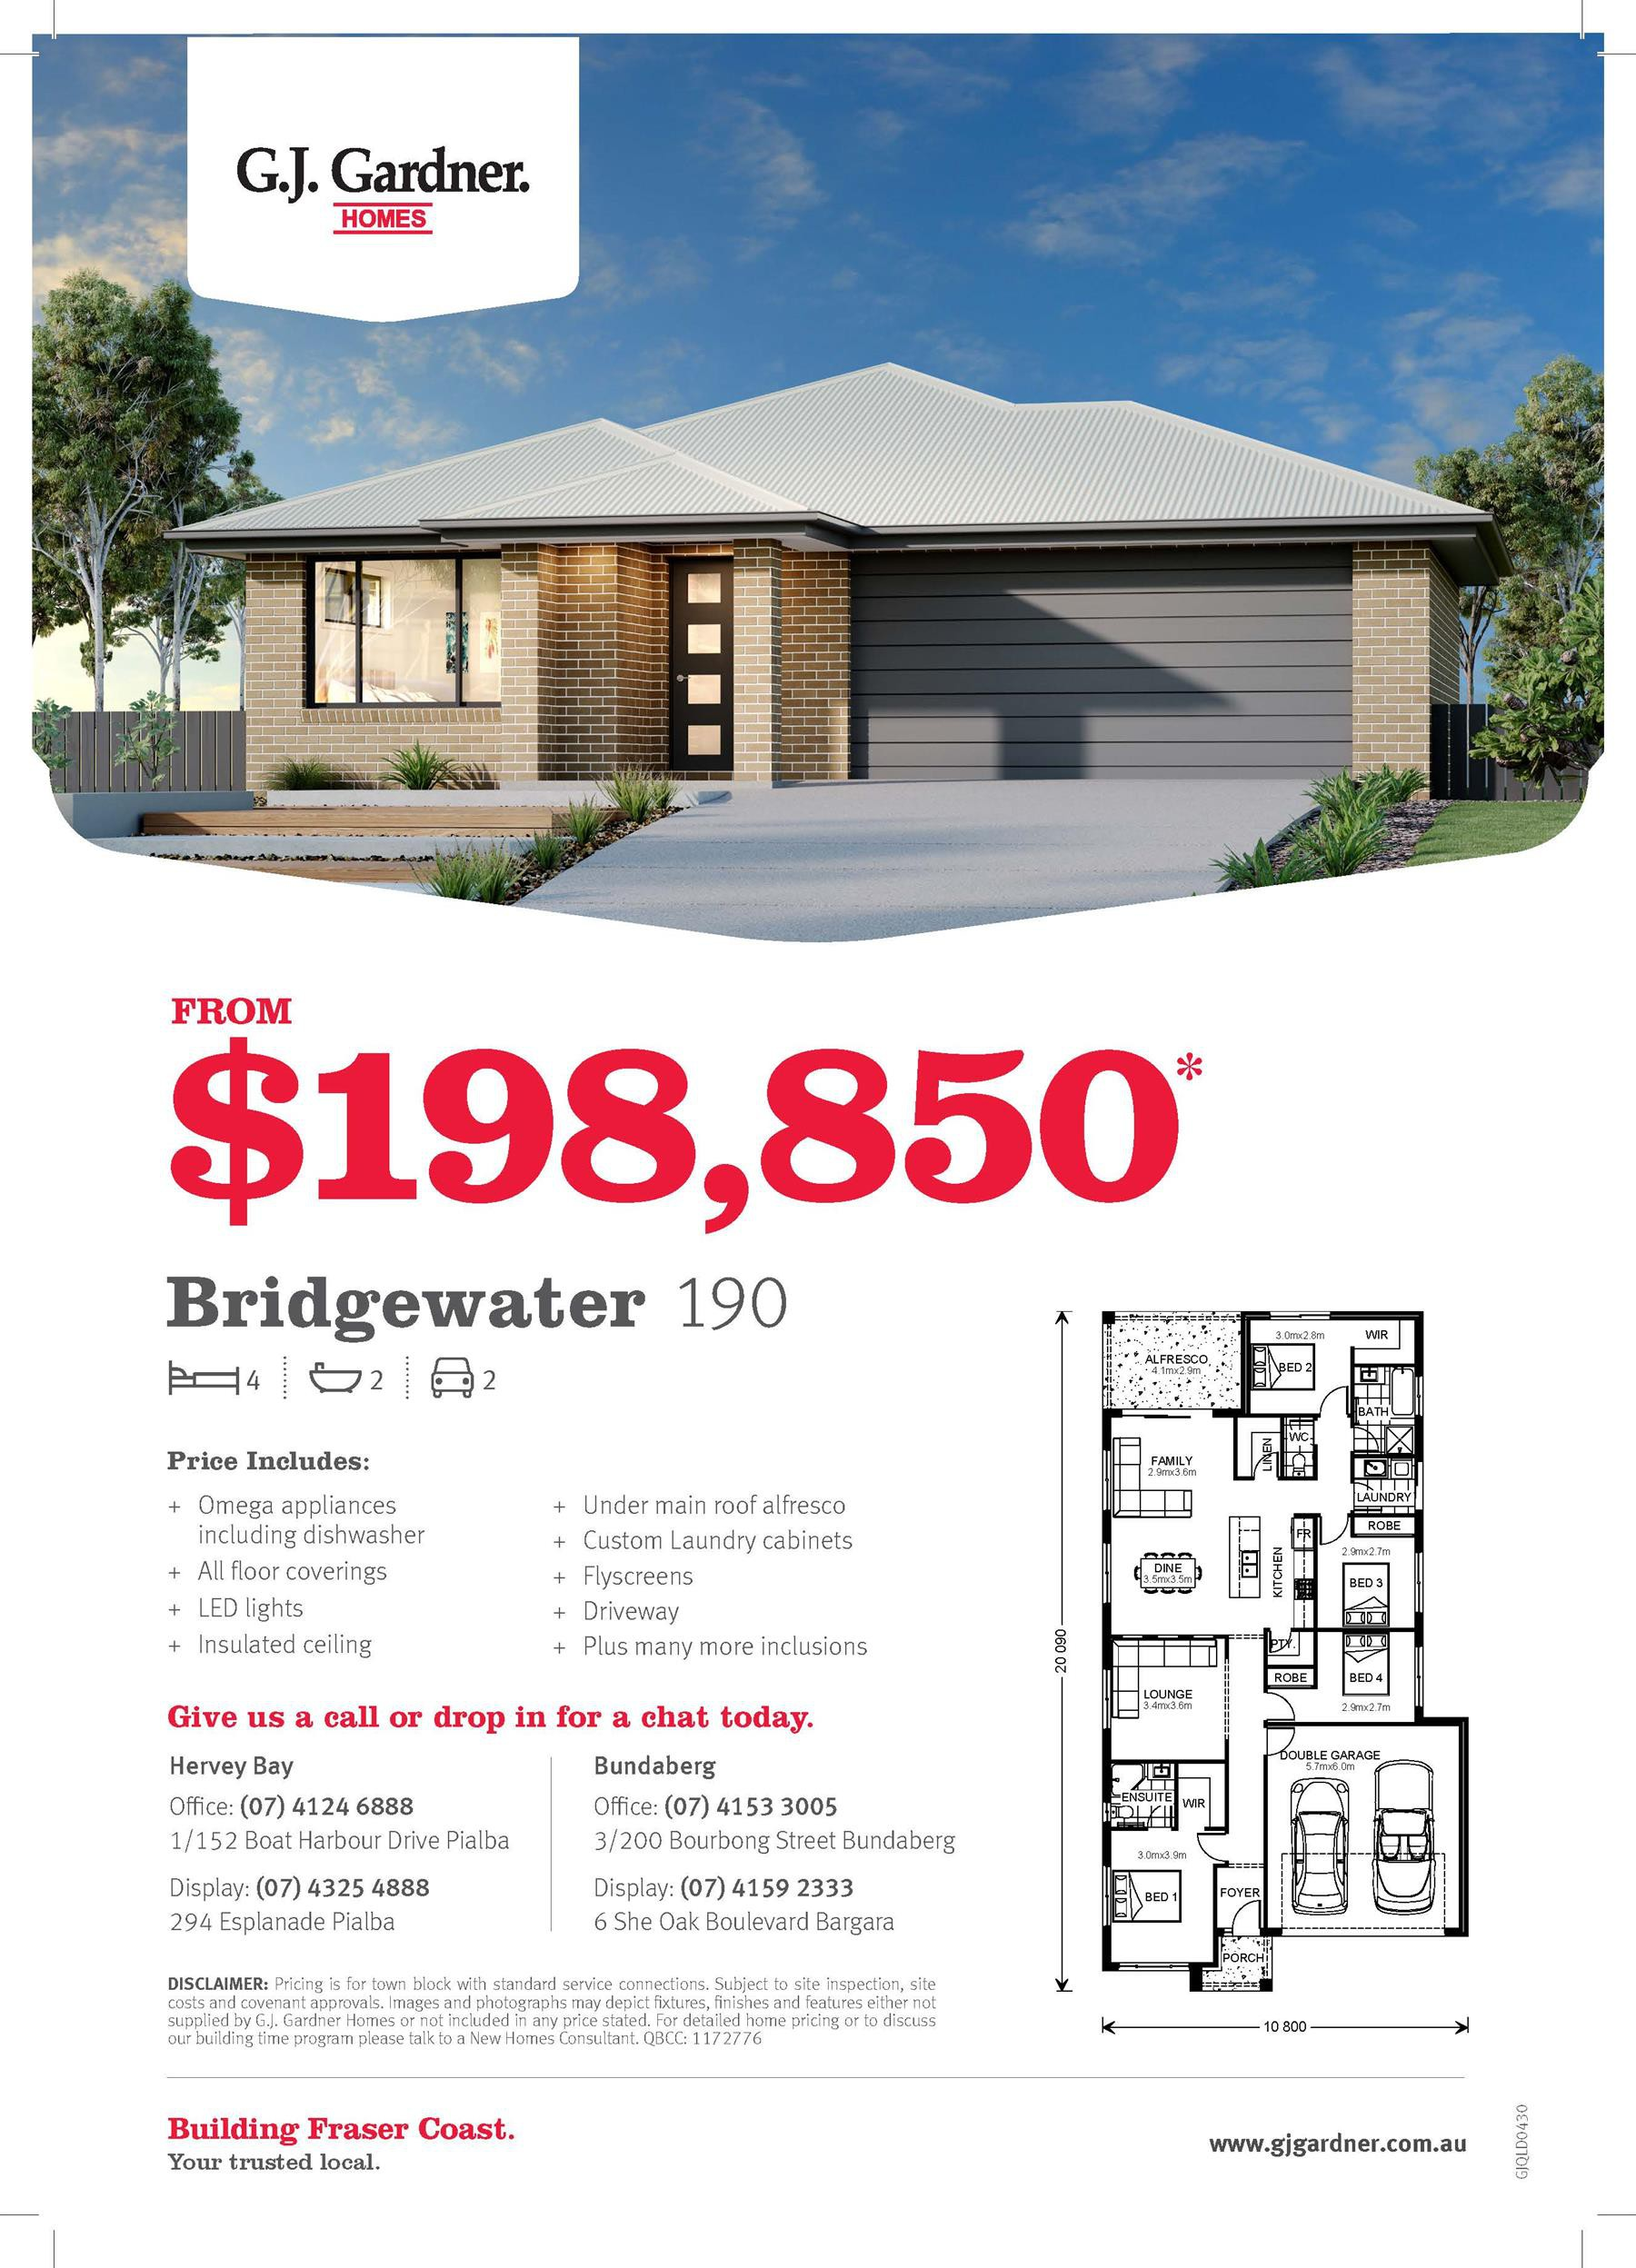 Pricing Special – Bridgewater 190!